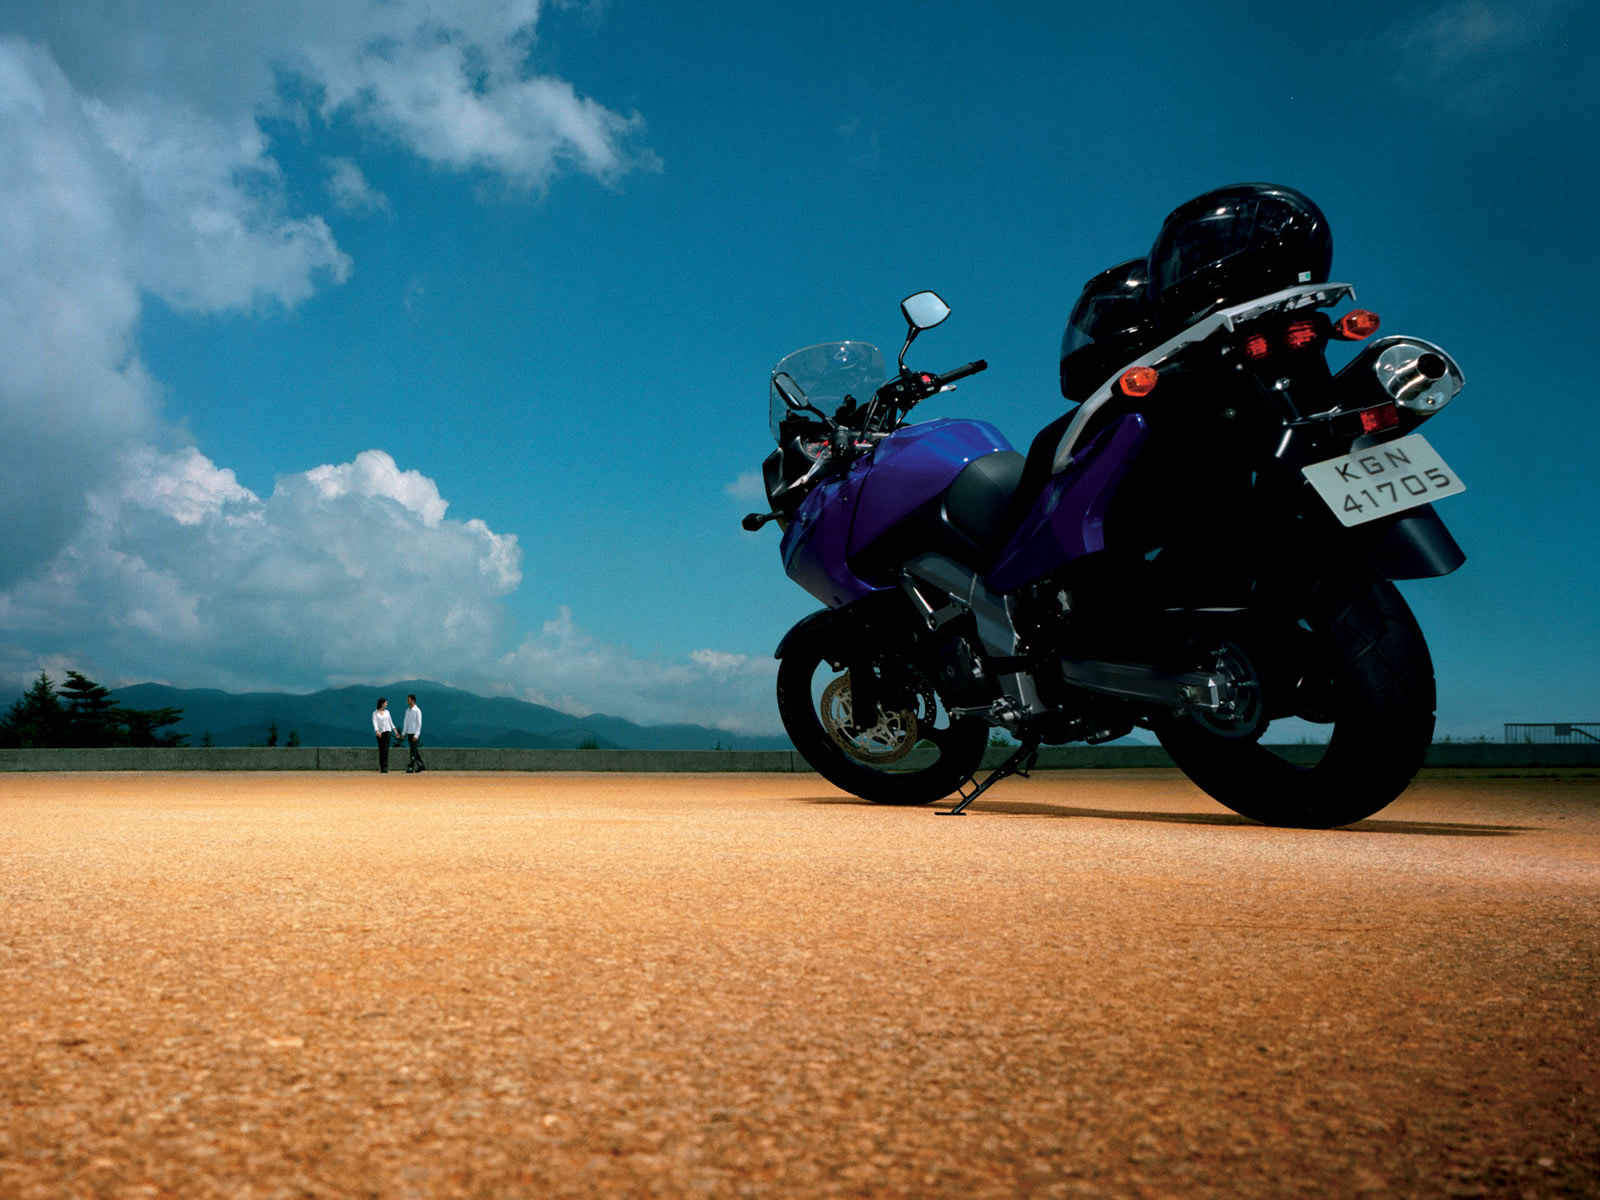 http://4.bp.blogspot.com/-DfzzP3GwuOM/TkhLqNrYG0I/AAAAAAAAAfY/Tvbf0XaSNcI/s1600/Suzuki-DL-650_V-Strom_2004_motorcycle-desktop-wallpaper_09.jpg